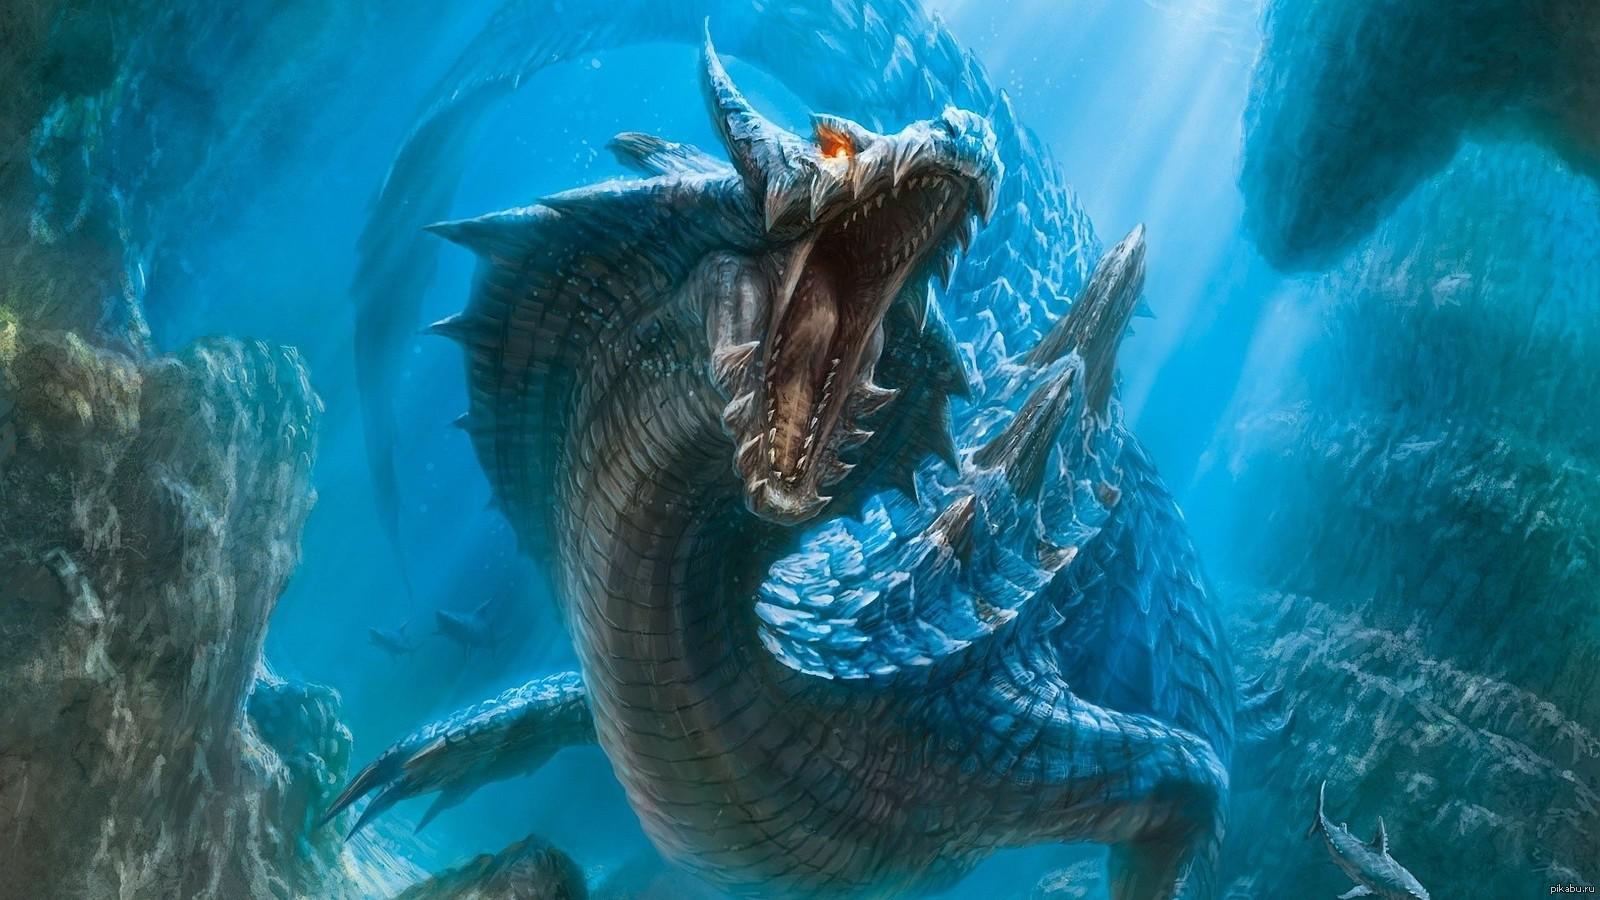 морской змей фото